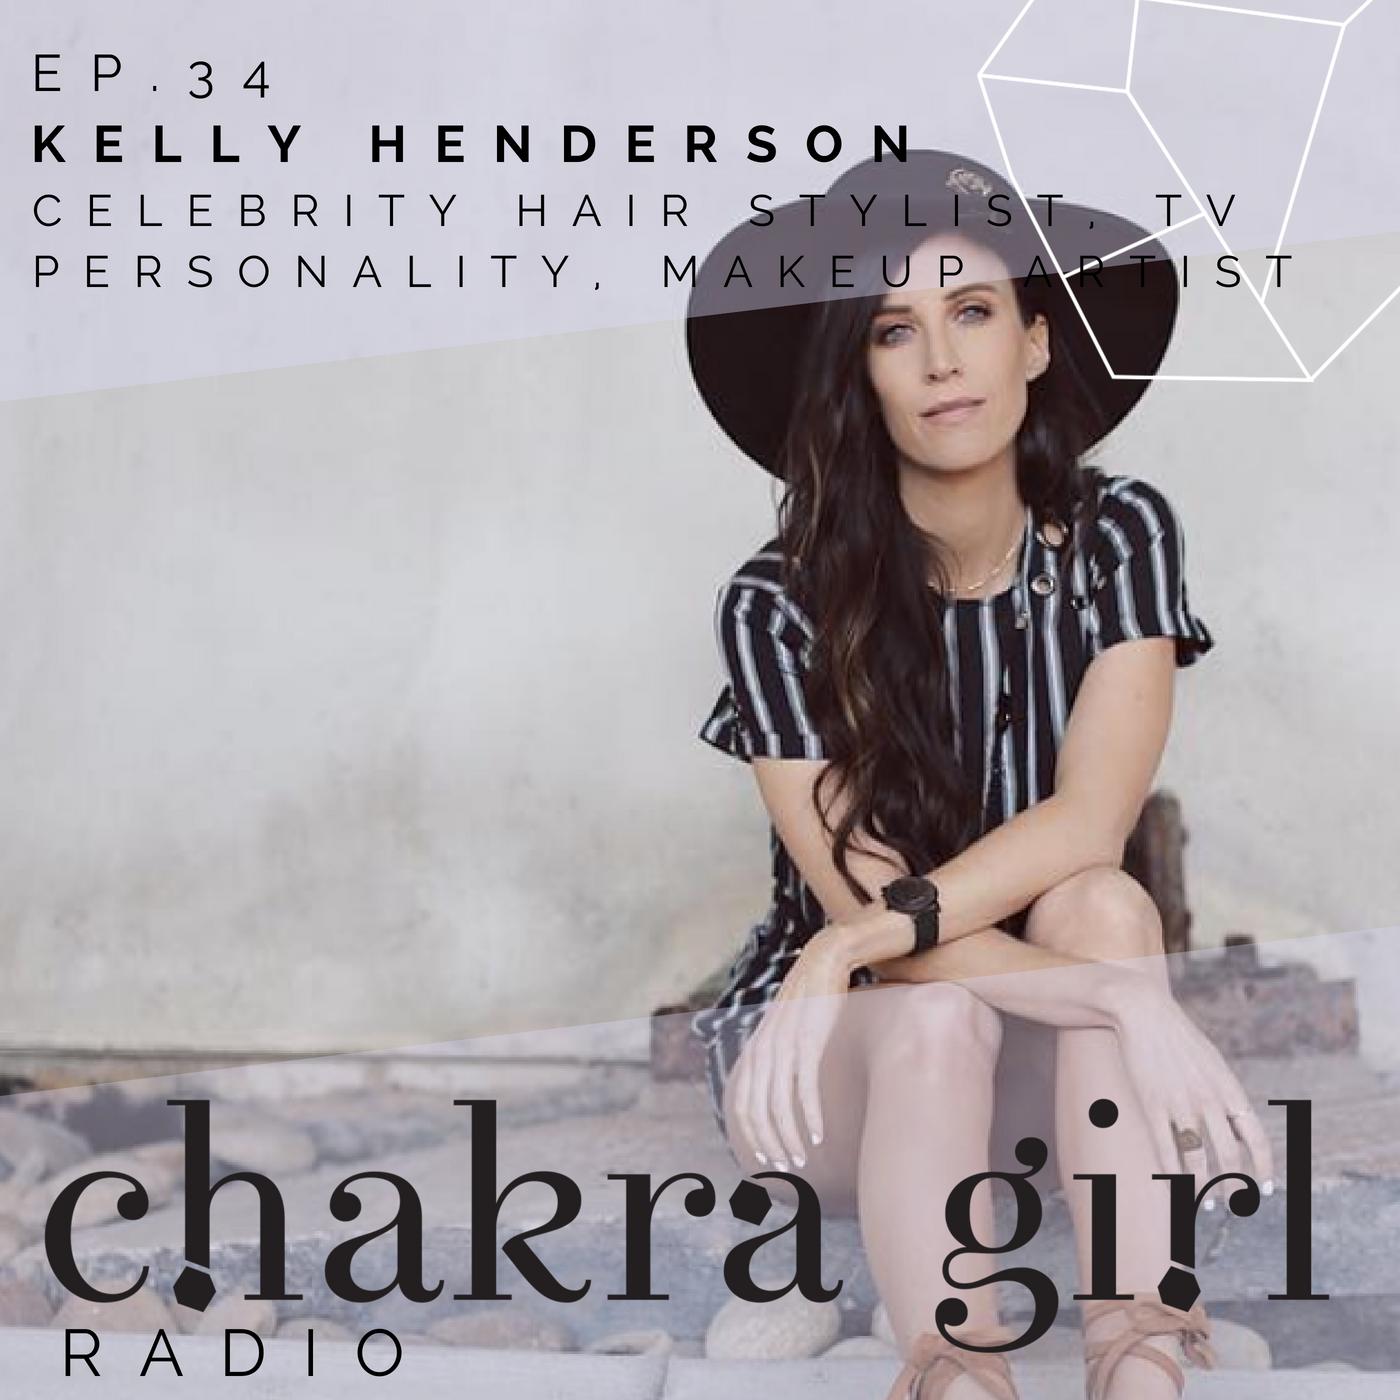 KELLY HENDERSON CHAKRA GIRL RADIO.png